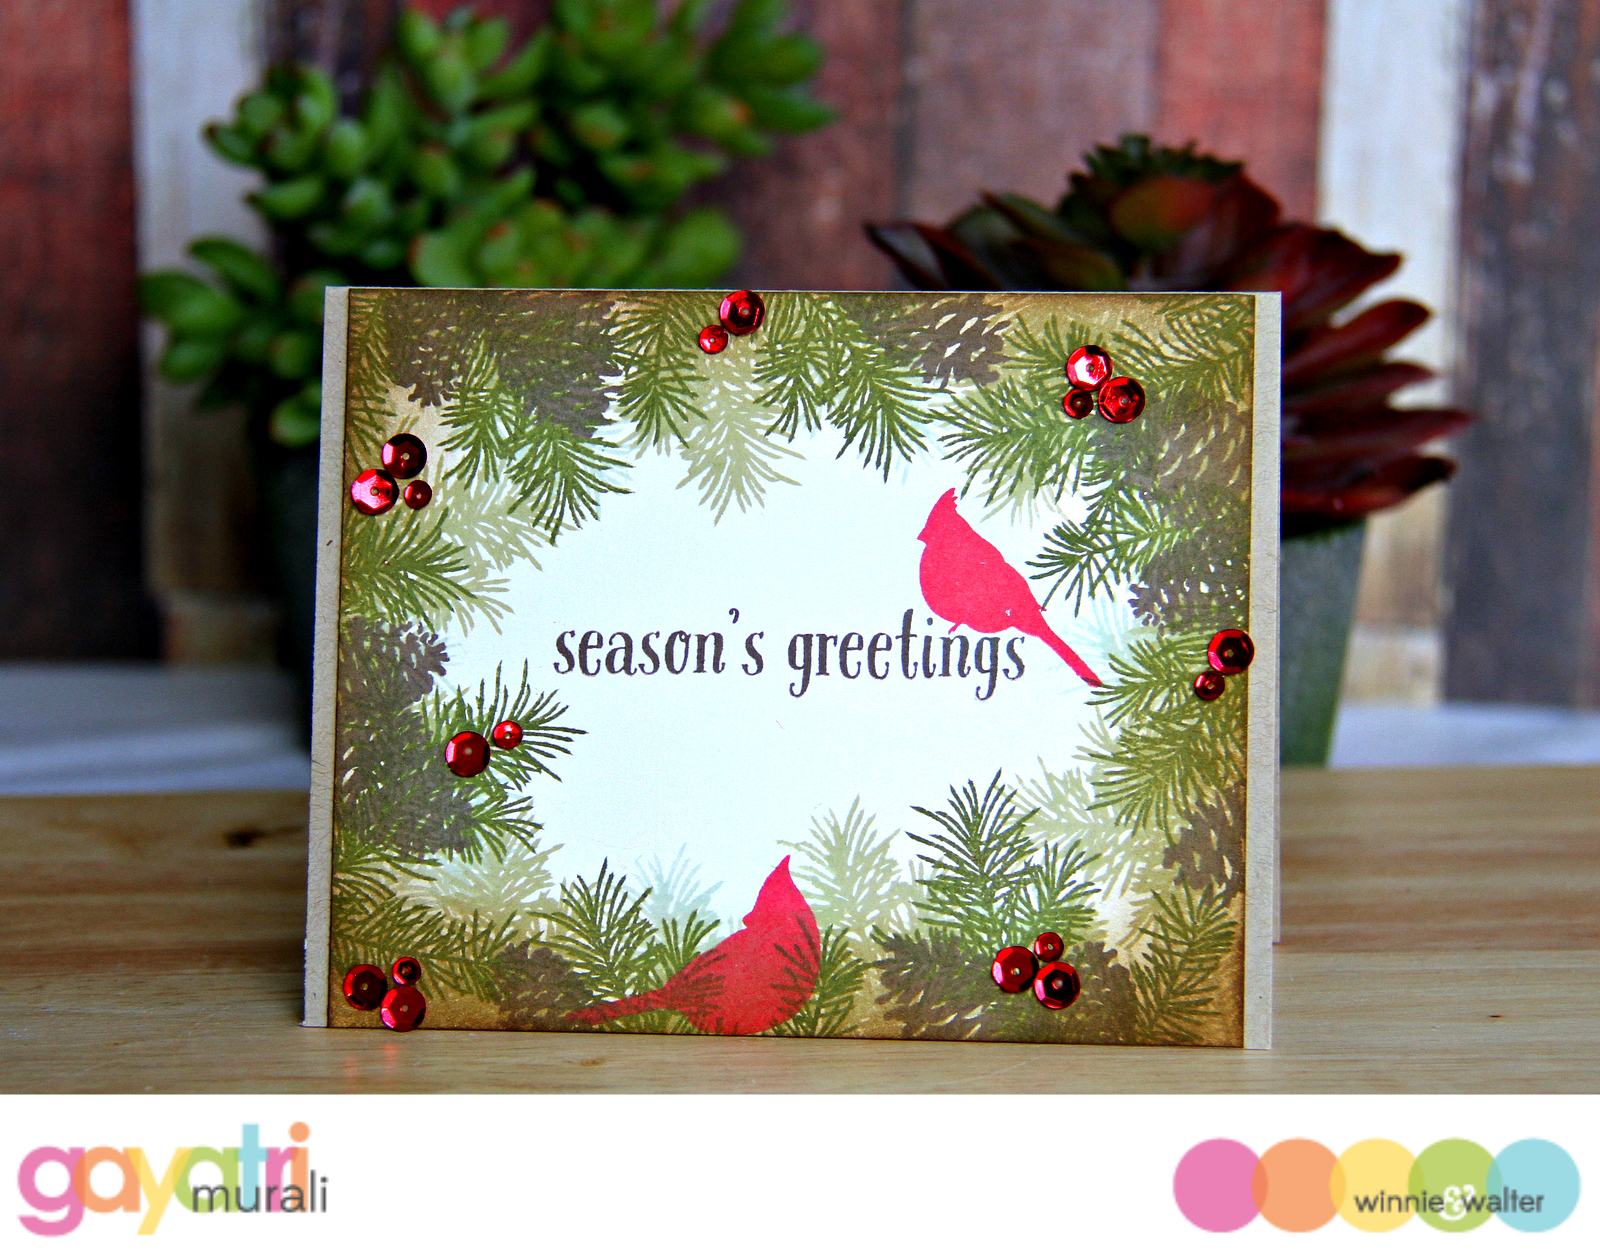 gayatri_seasons_greetings